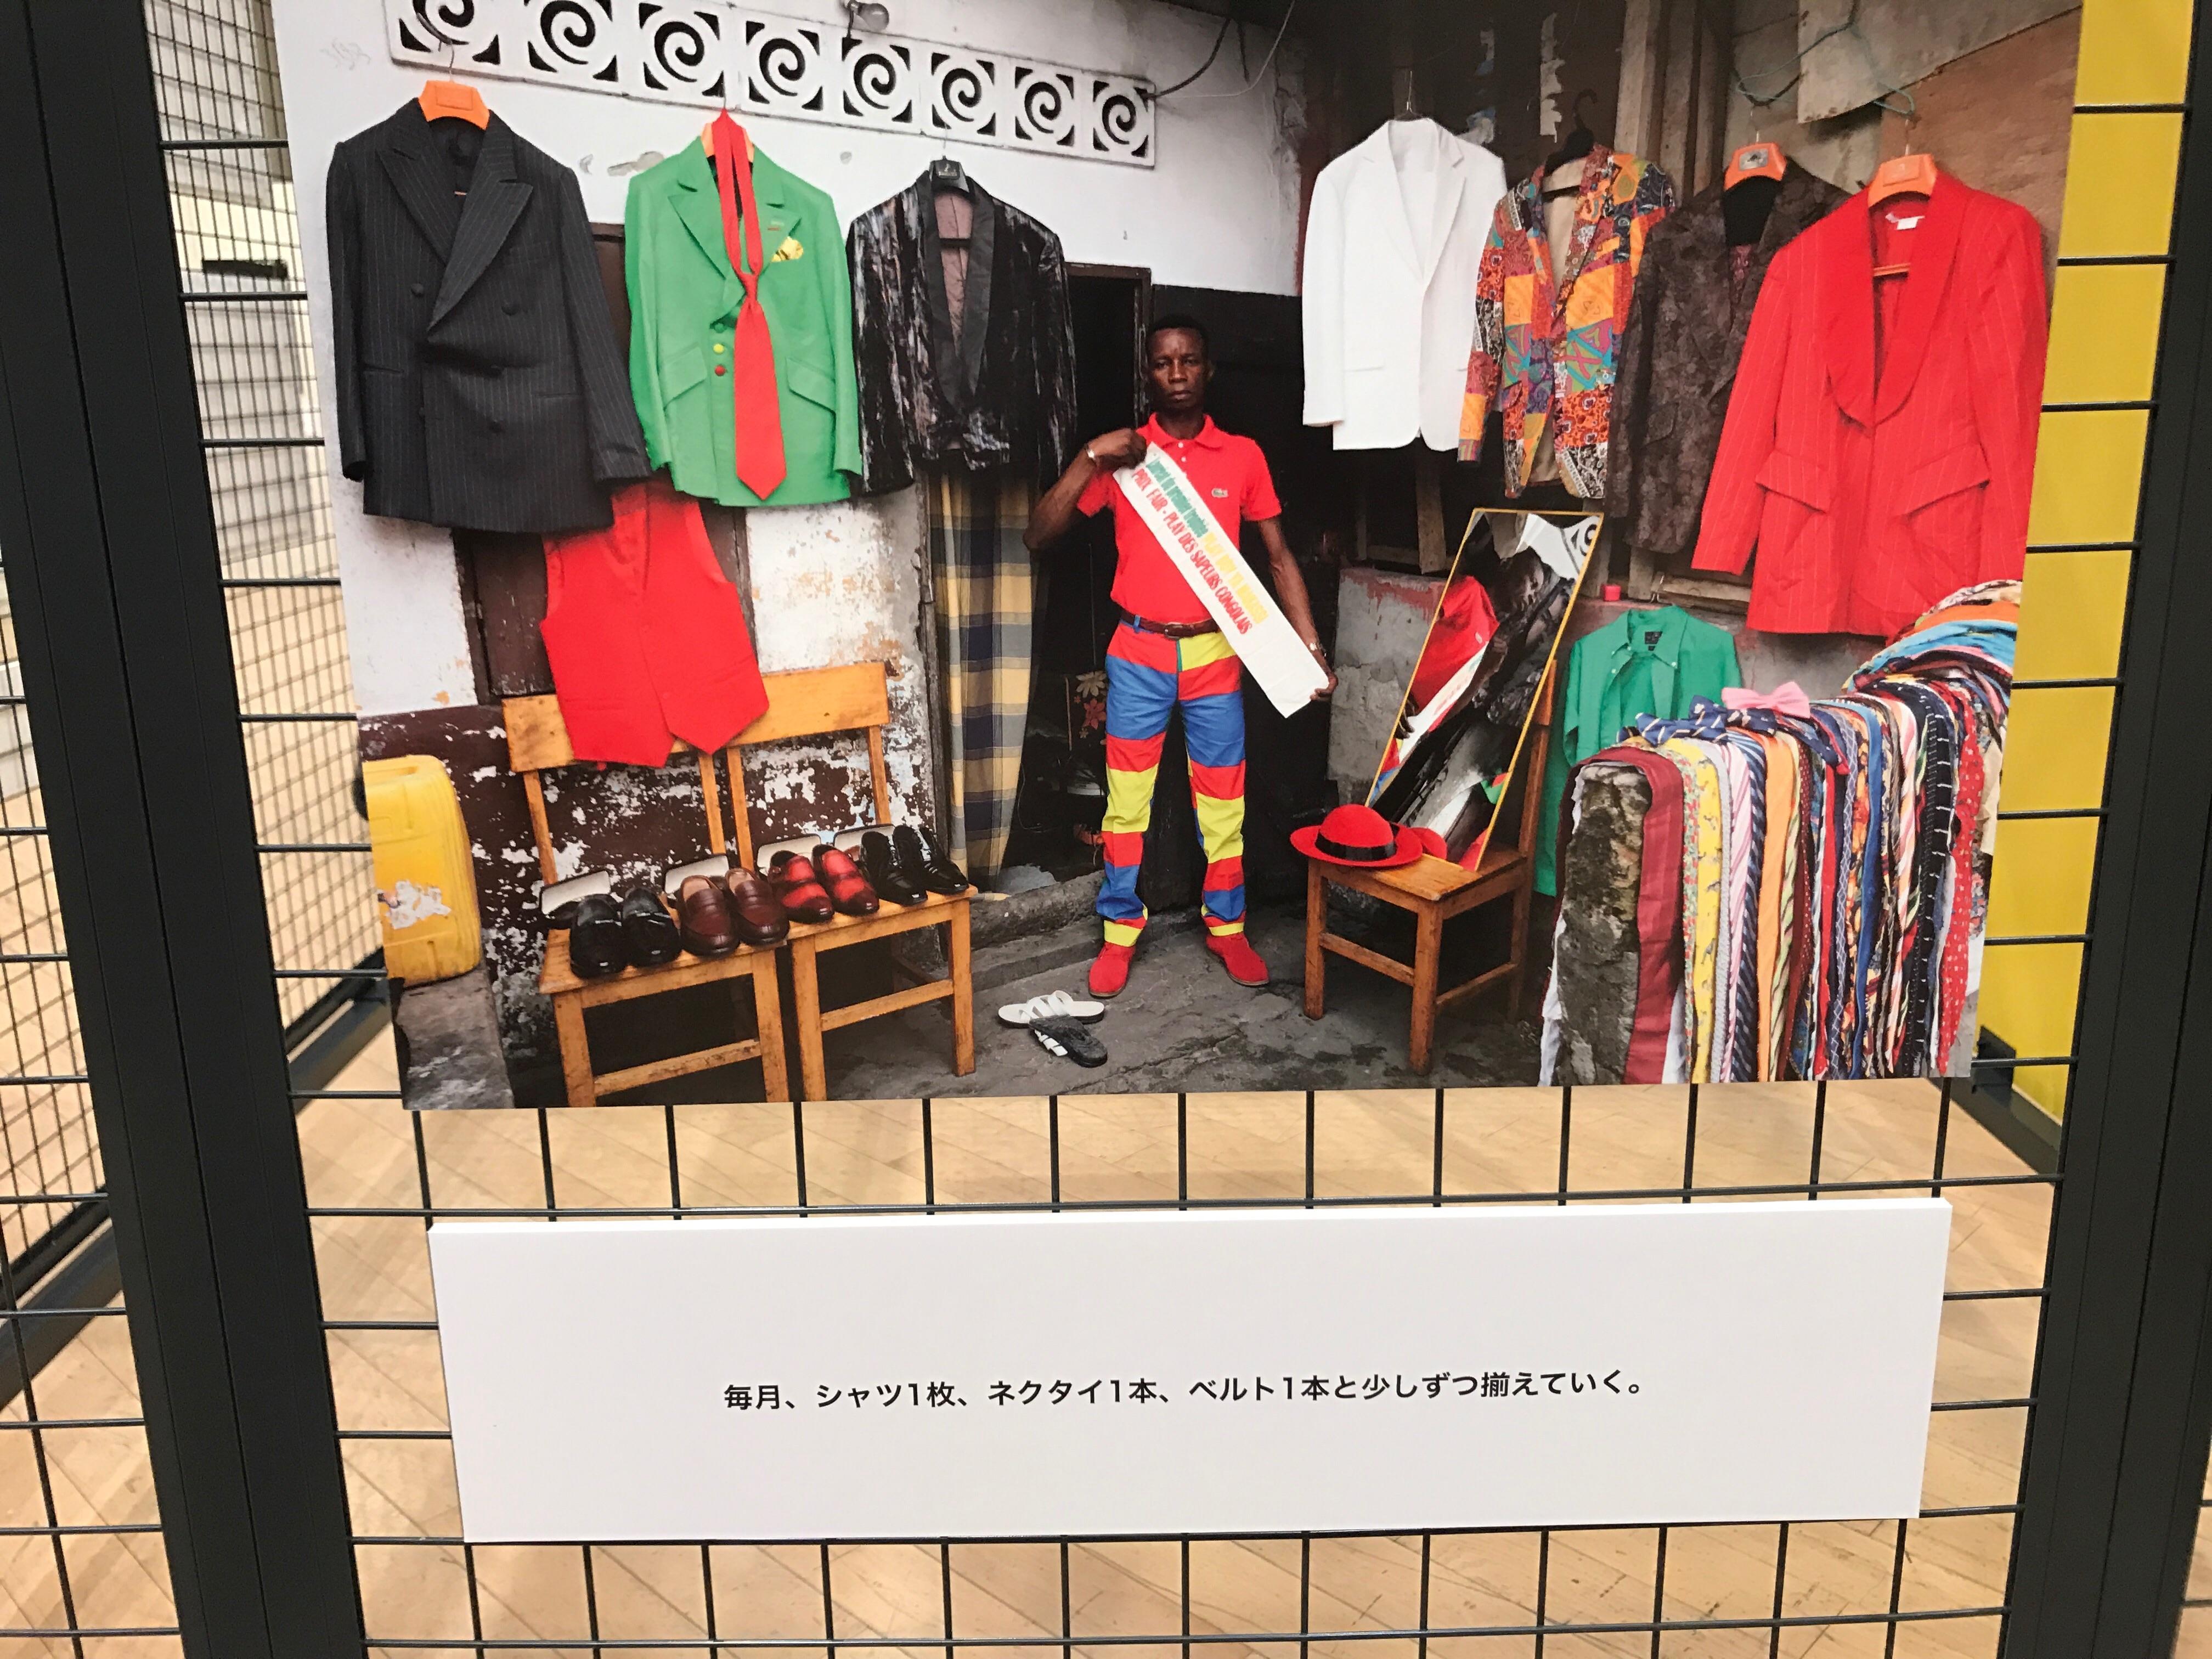 f:id:hironoriiyoshiiii:20170910215740j:image